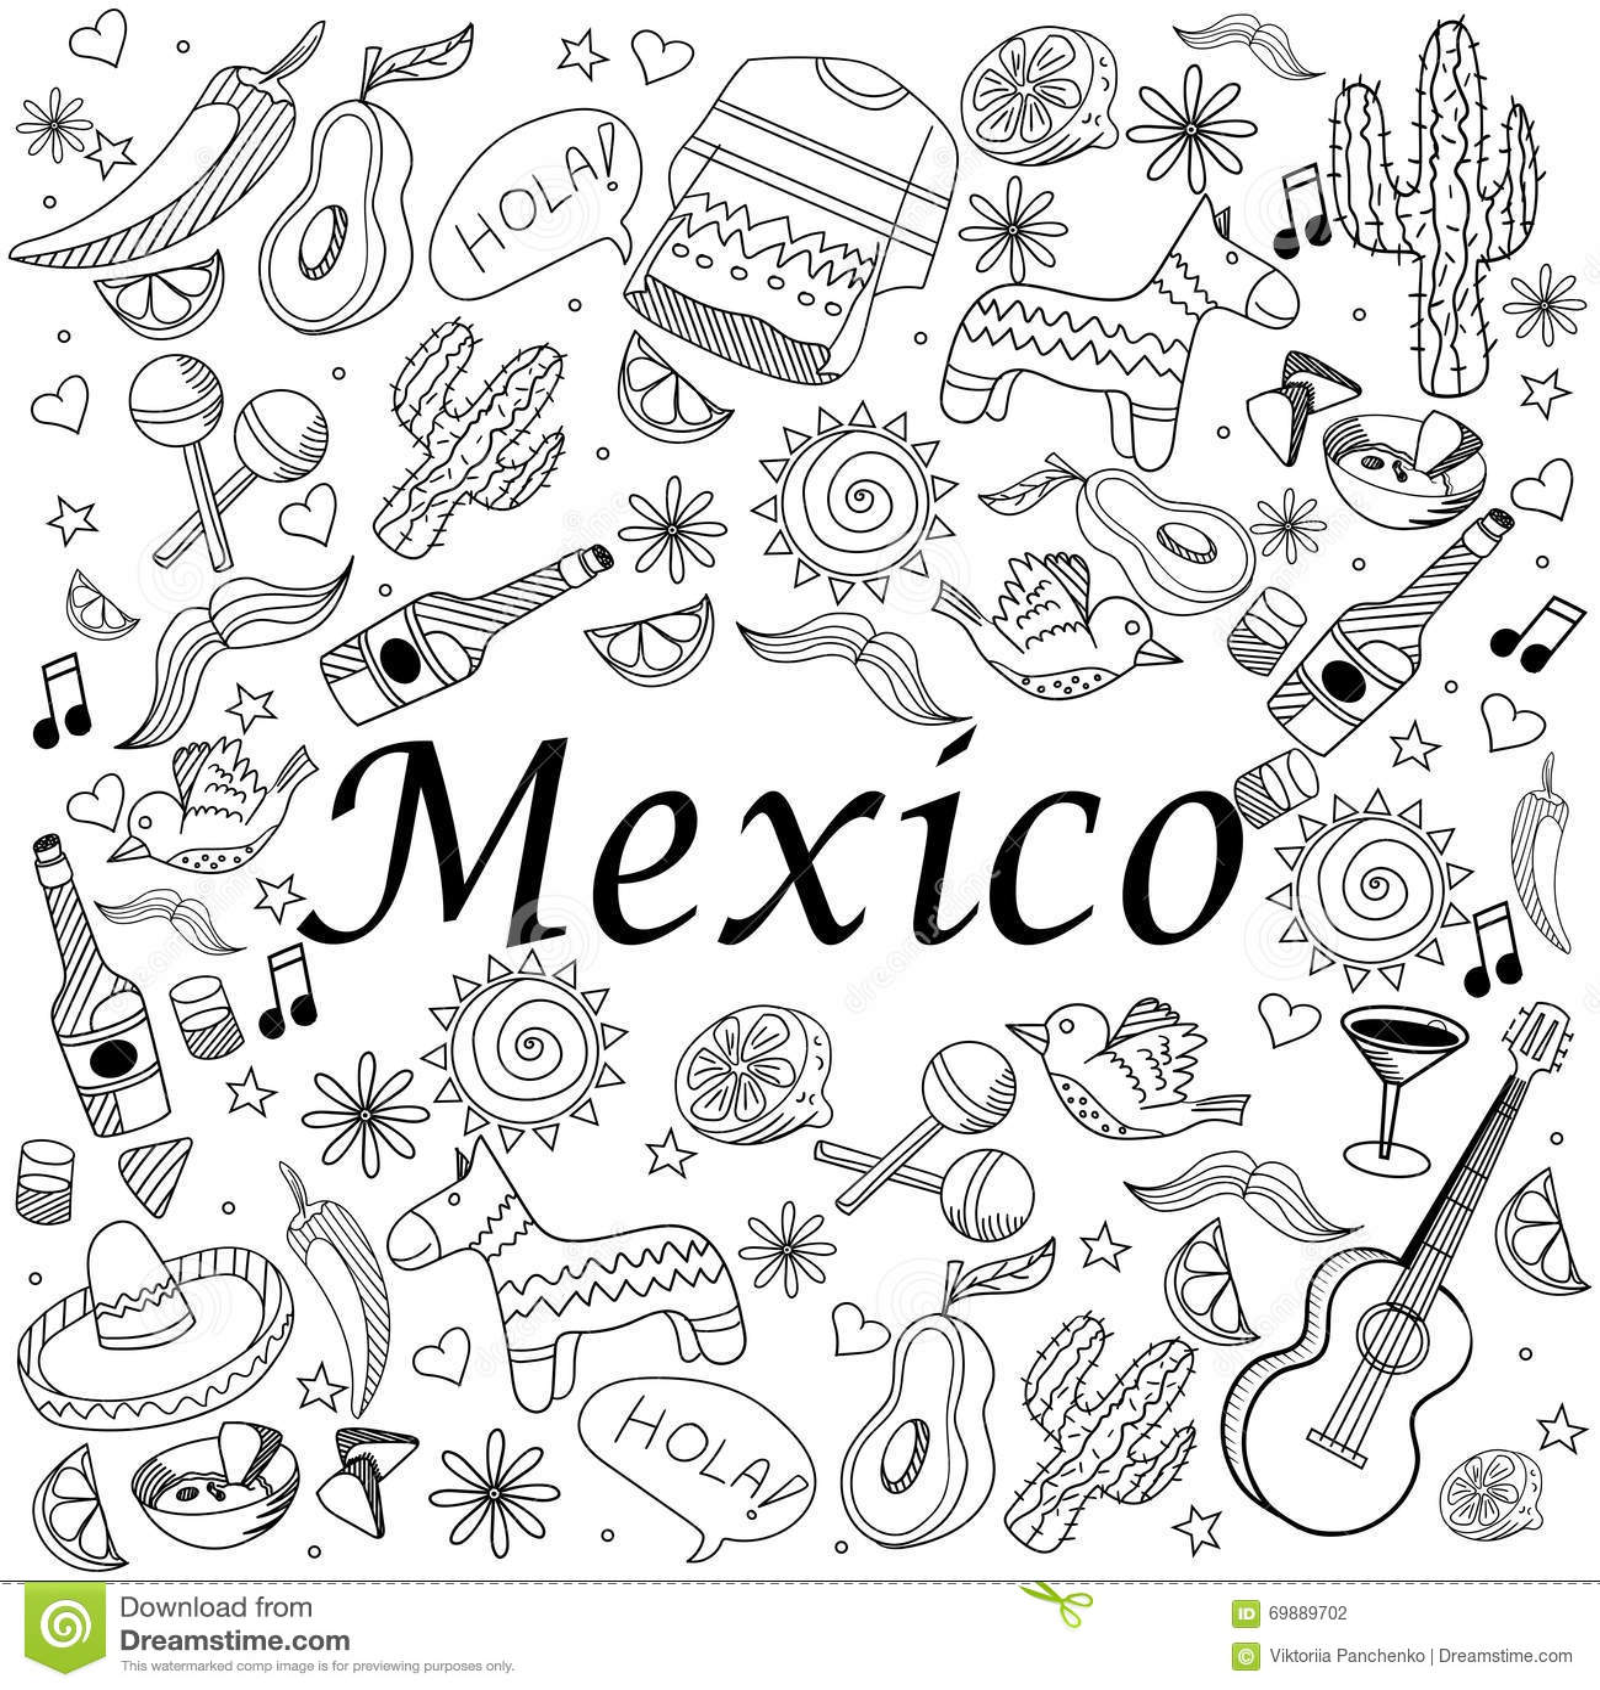 Mexico Coloring Book Vector Illustration Stock Vector